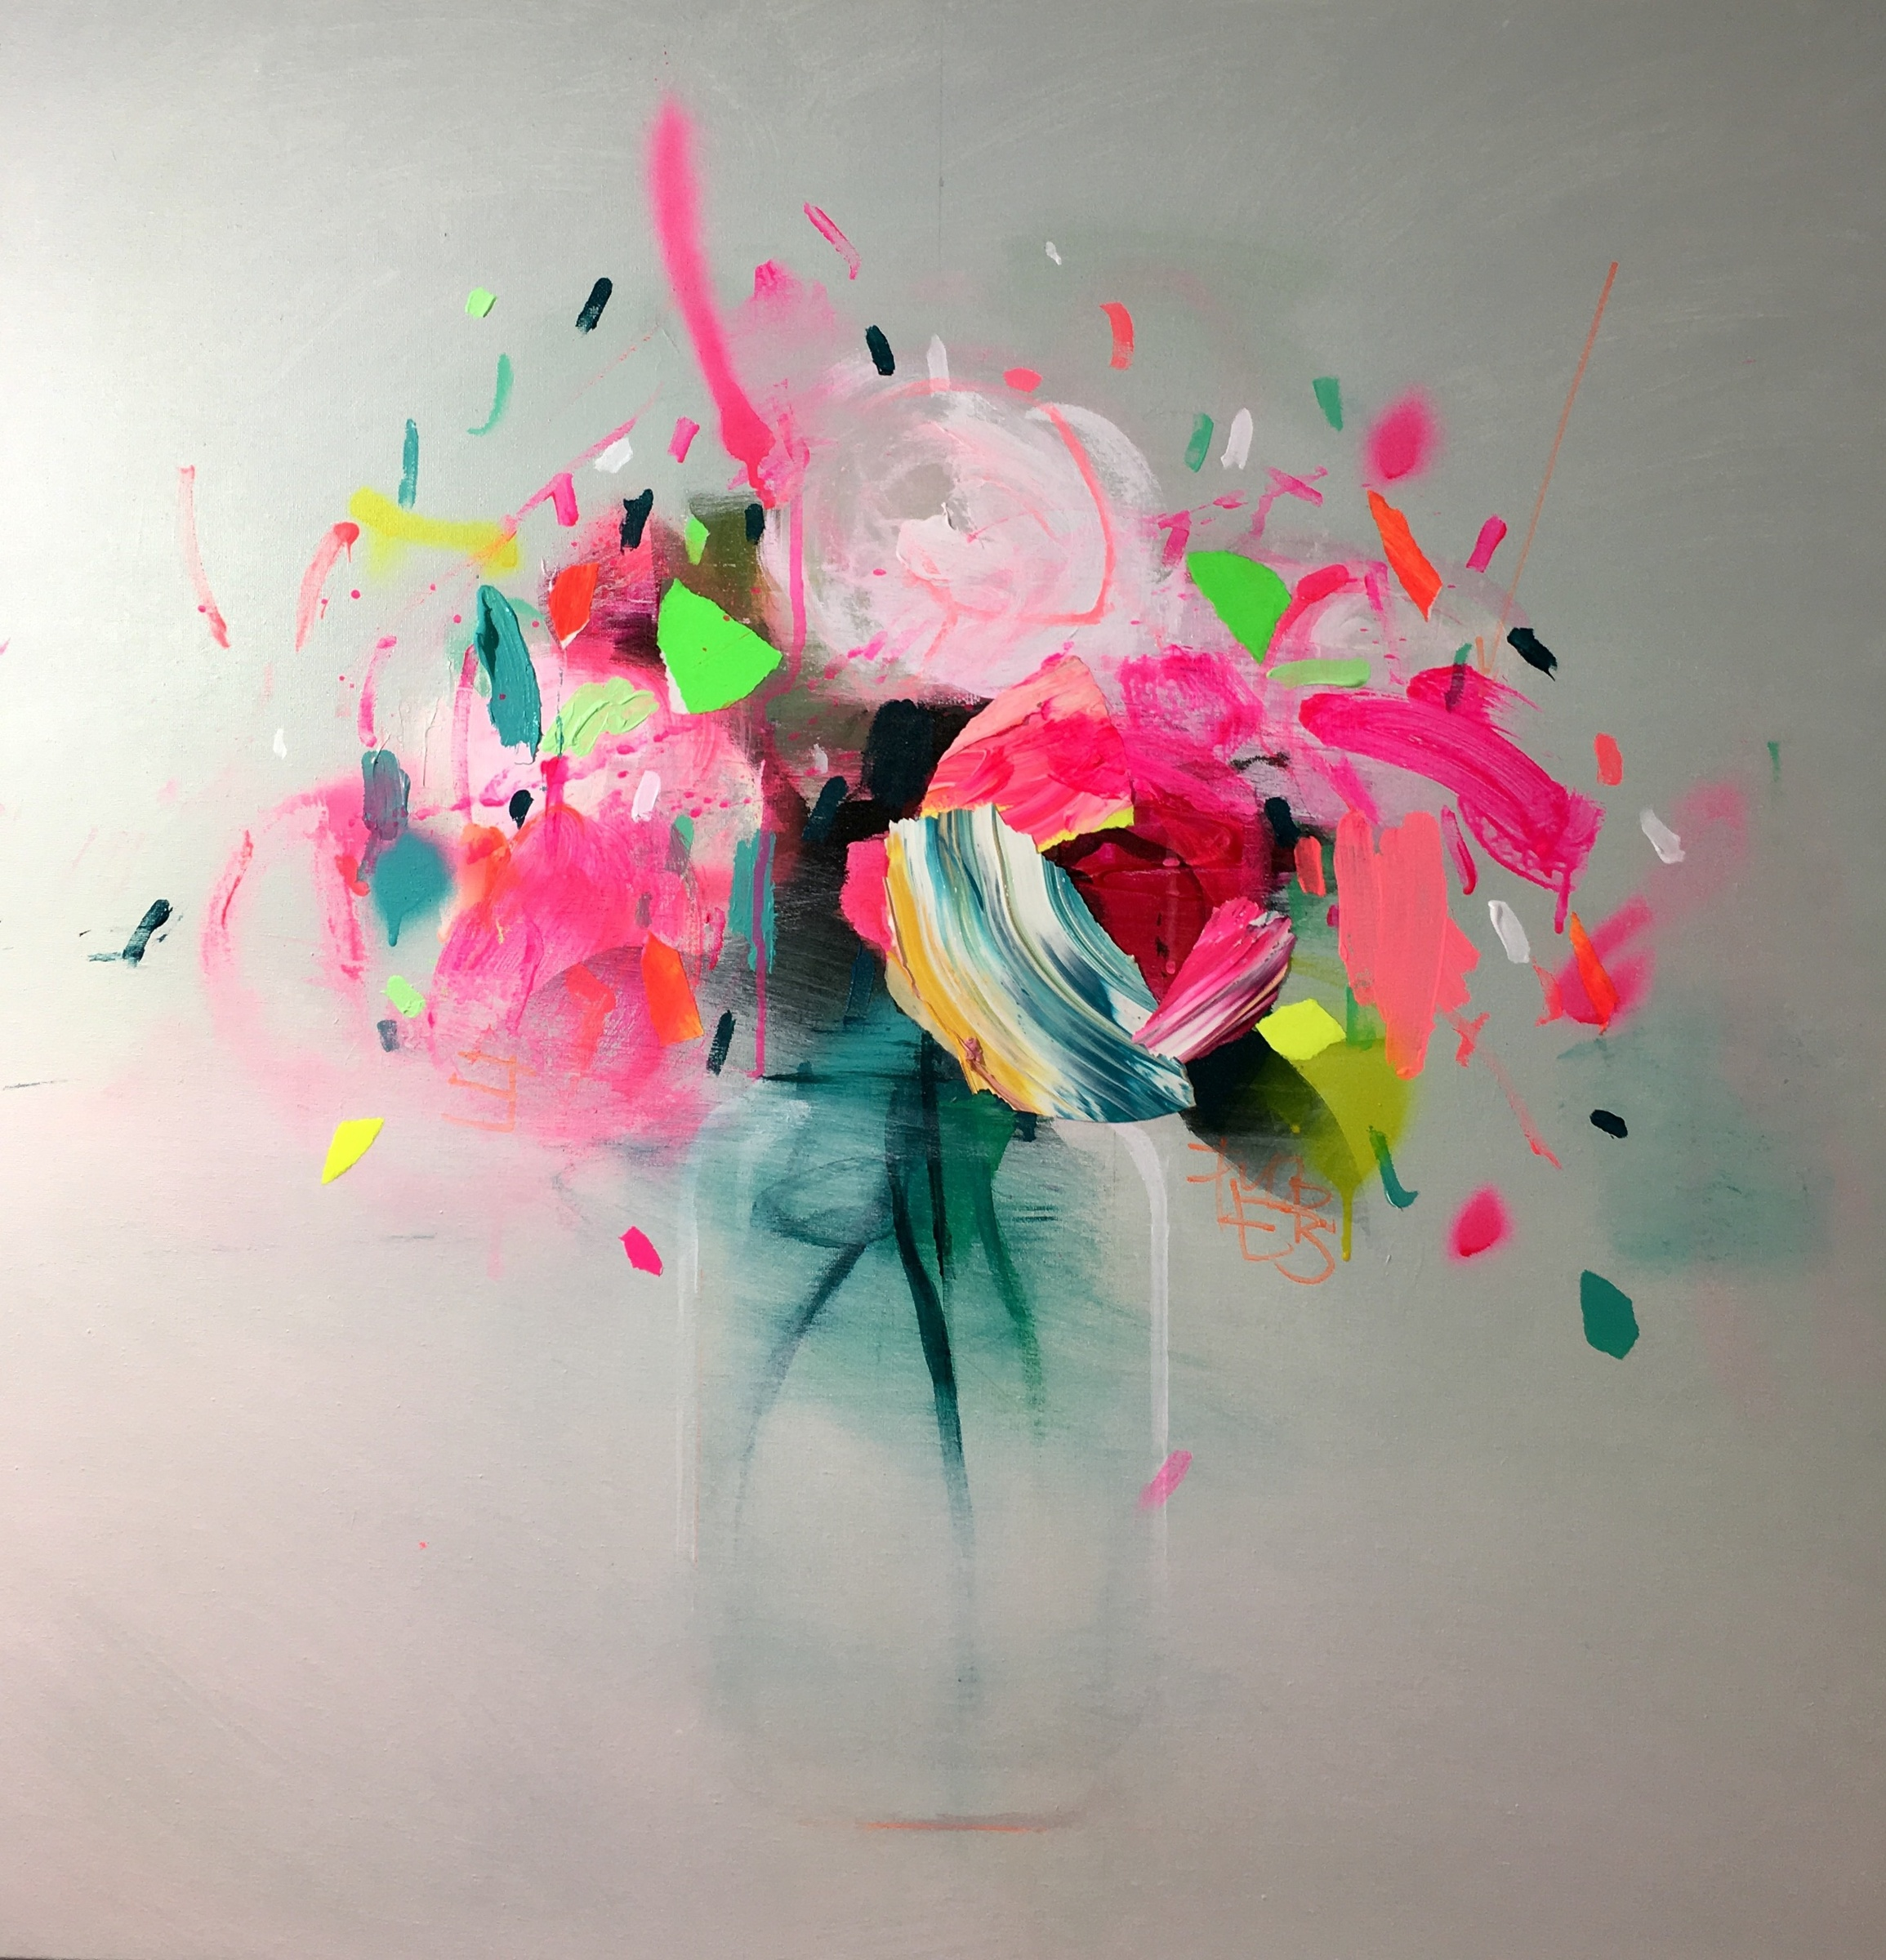 fran mora neon flowers 2017 strange tracey